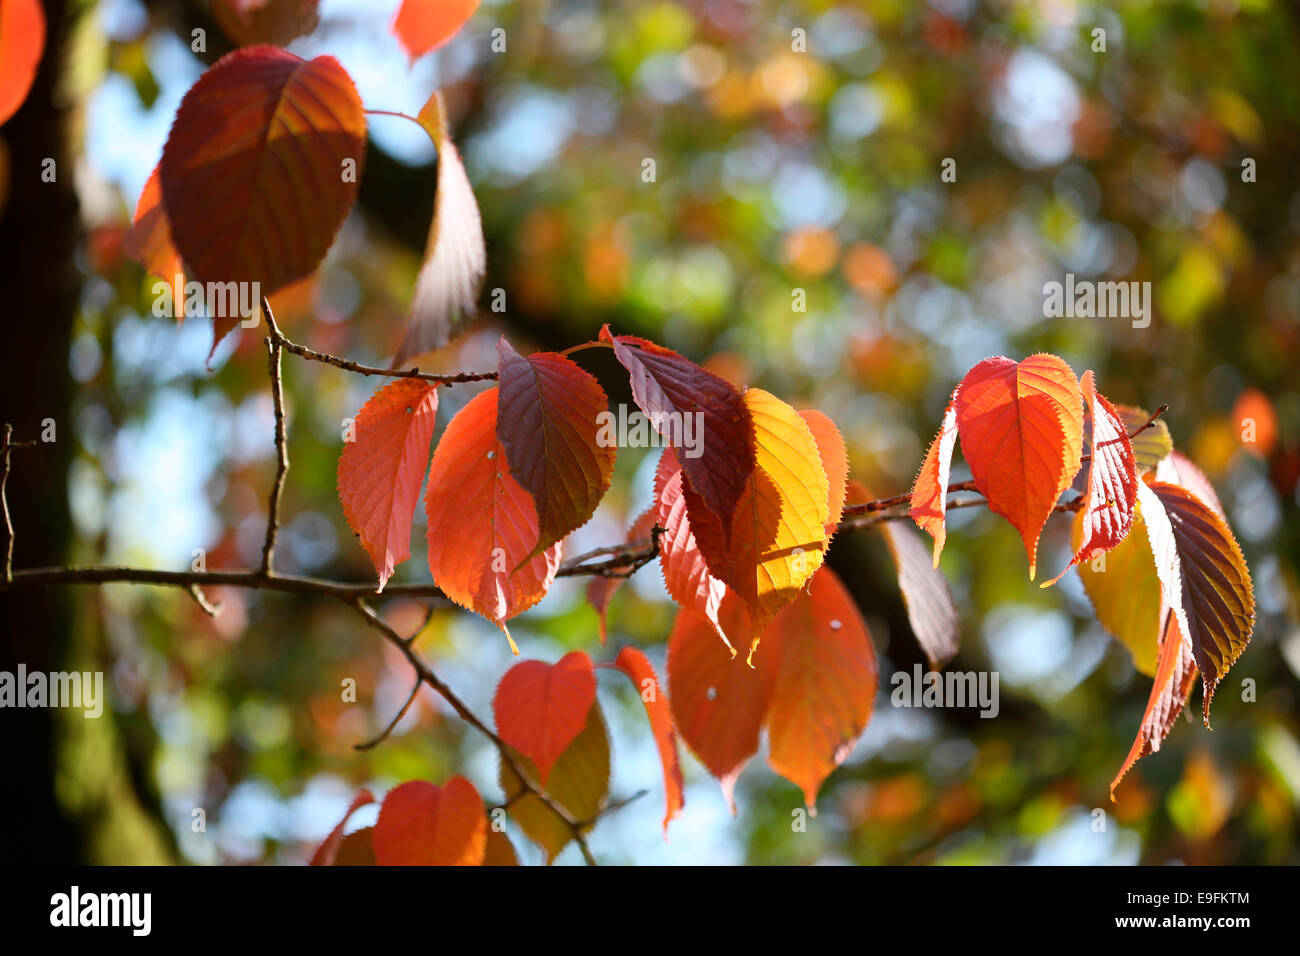 autumnal leaves Sargent's Cherry tree Jane Ann Butler Photography JABP1313 Stock Photo